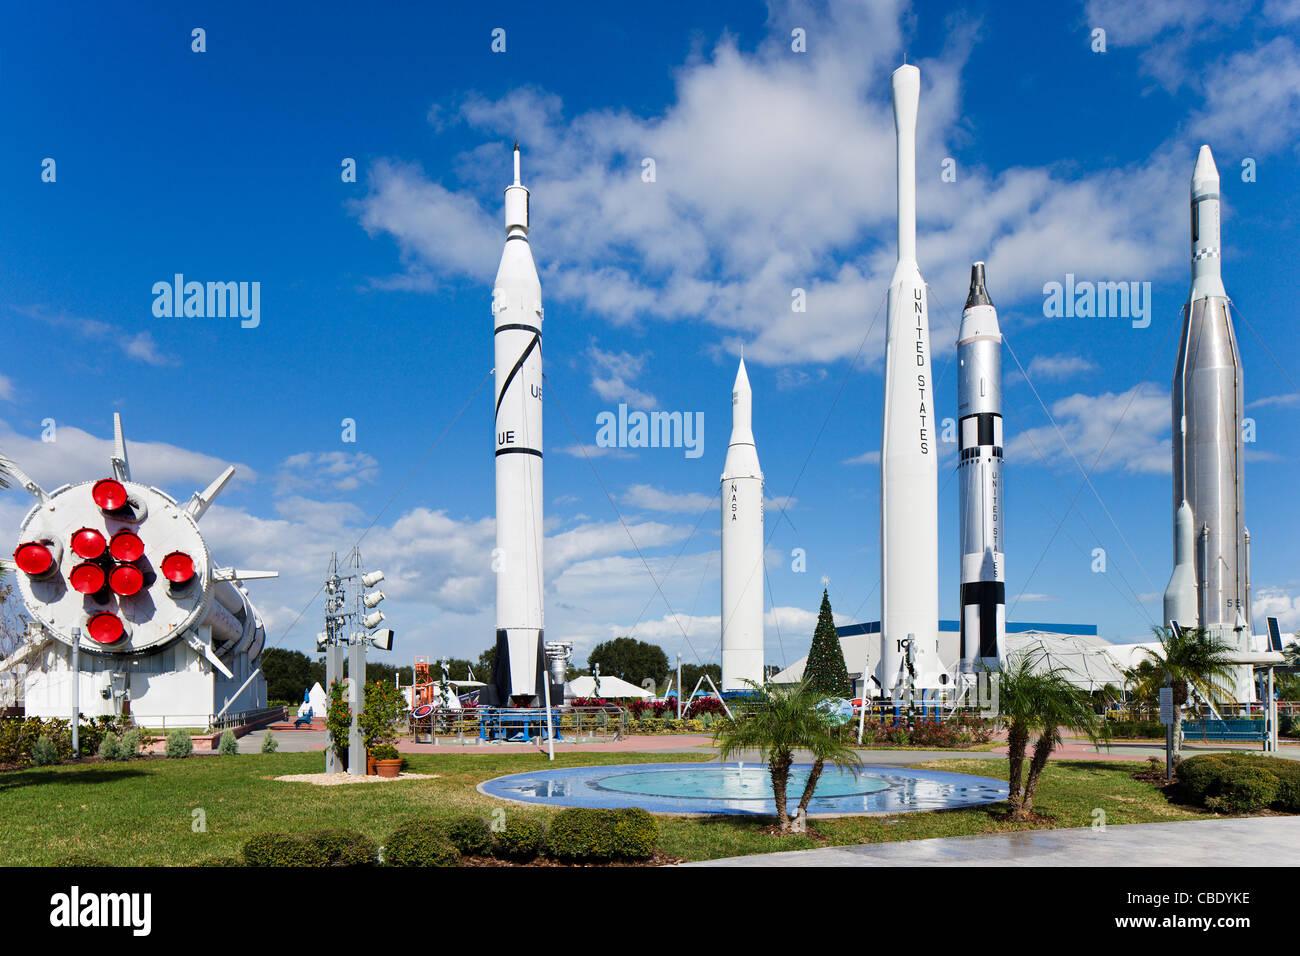 The Rocket Garden, Kennedy Space Center Visitor Complex, Merritt Island, Florida, USA - Stock Image